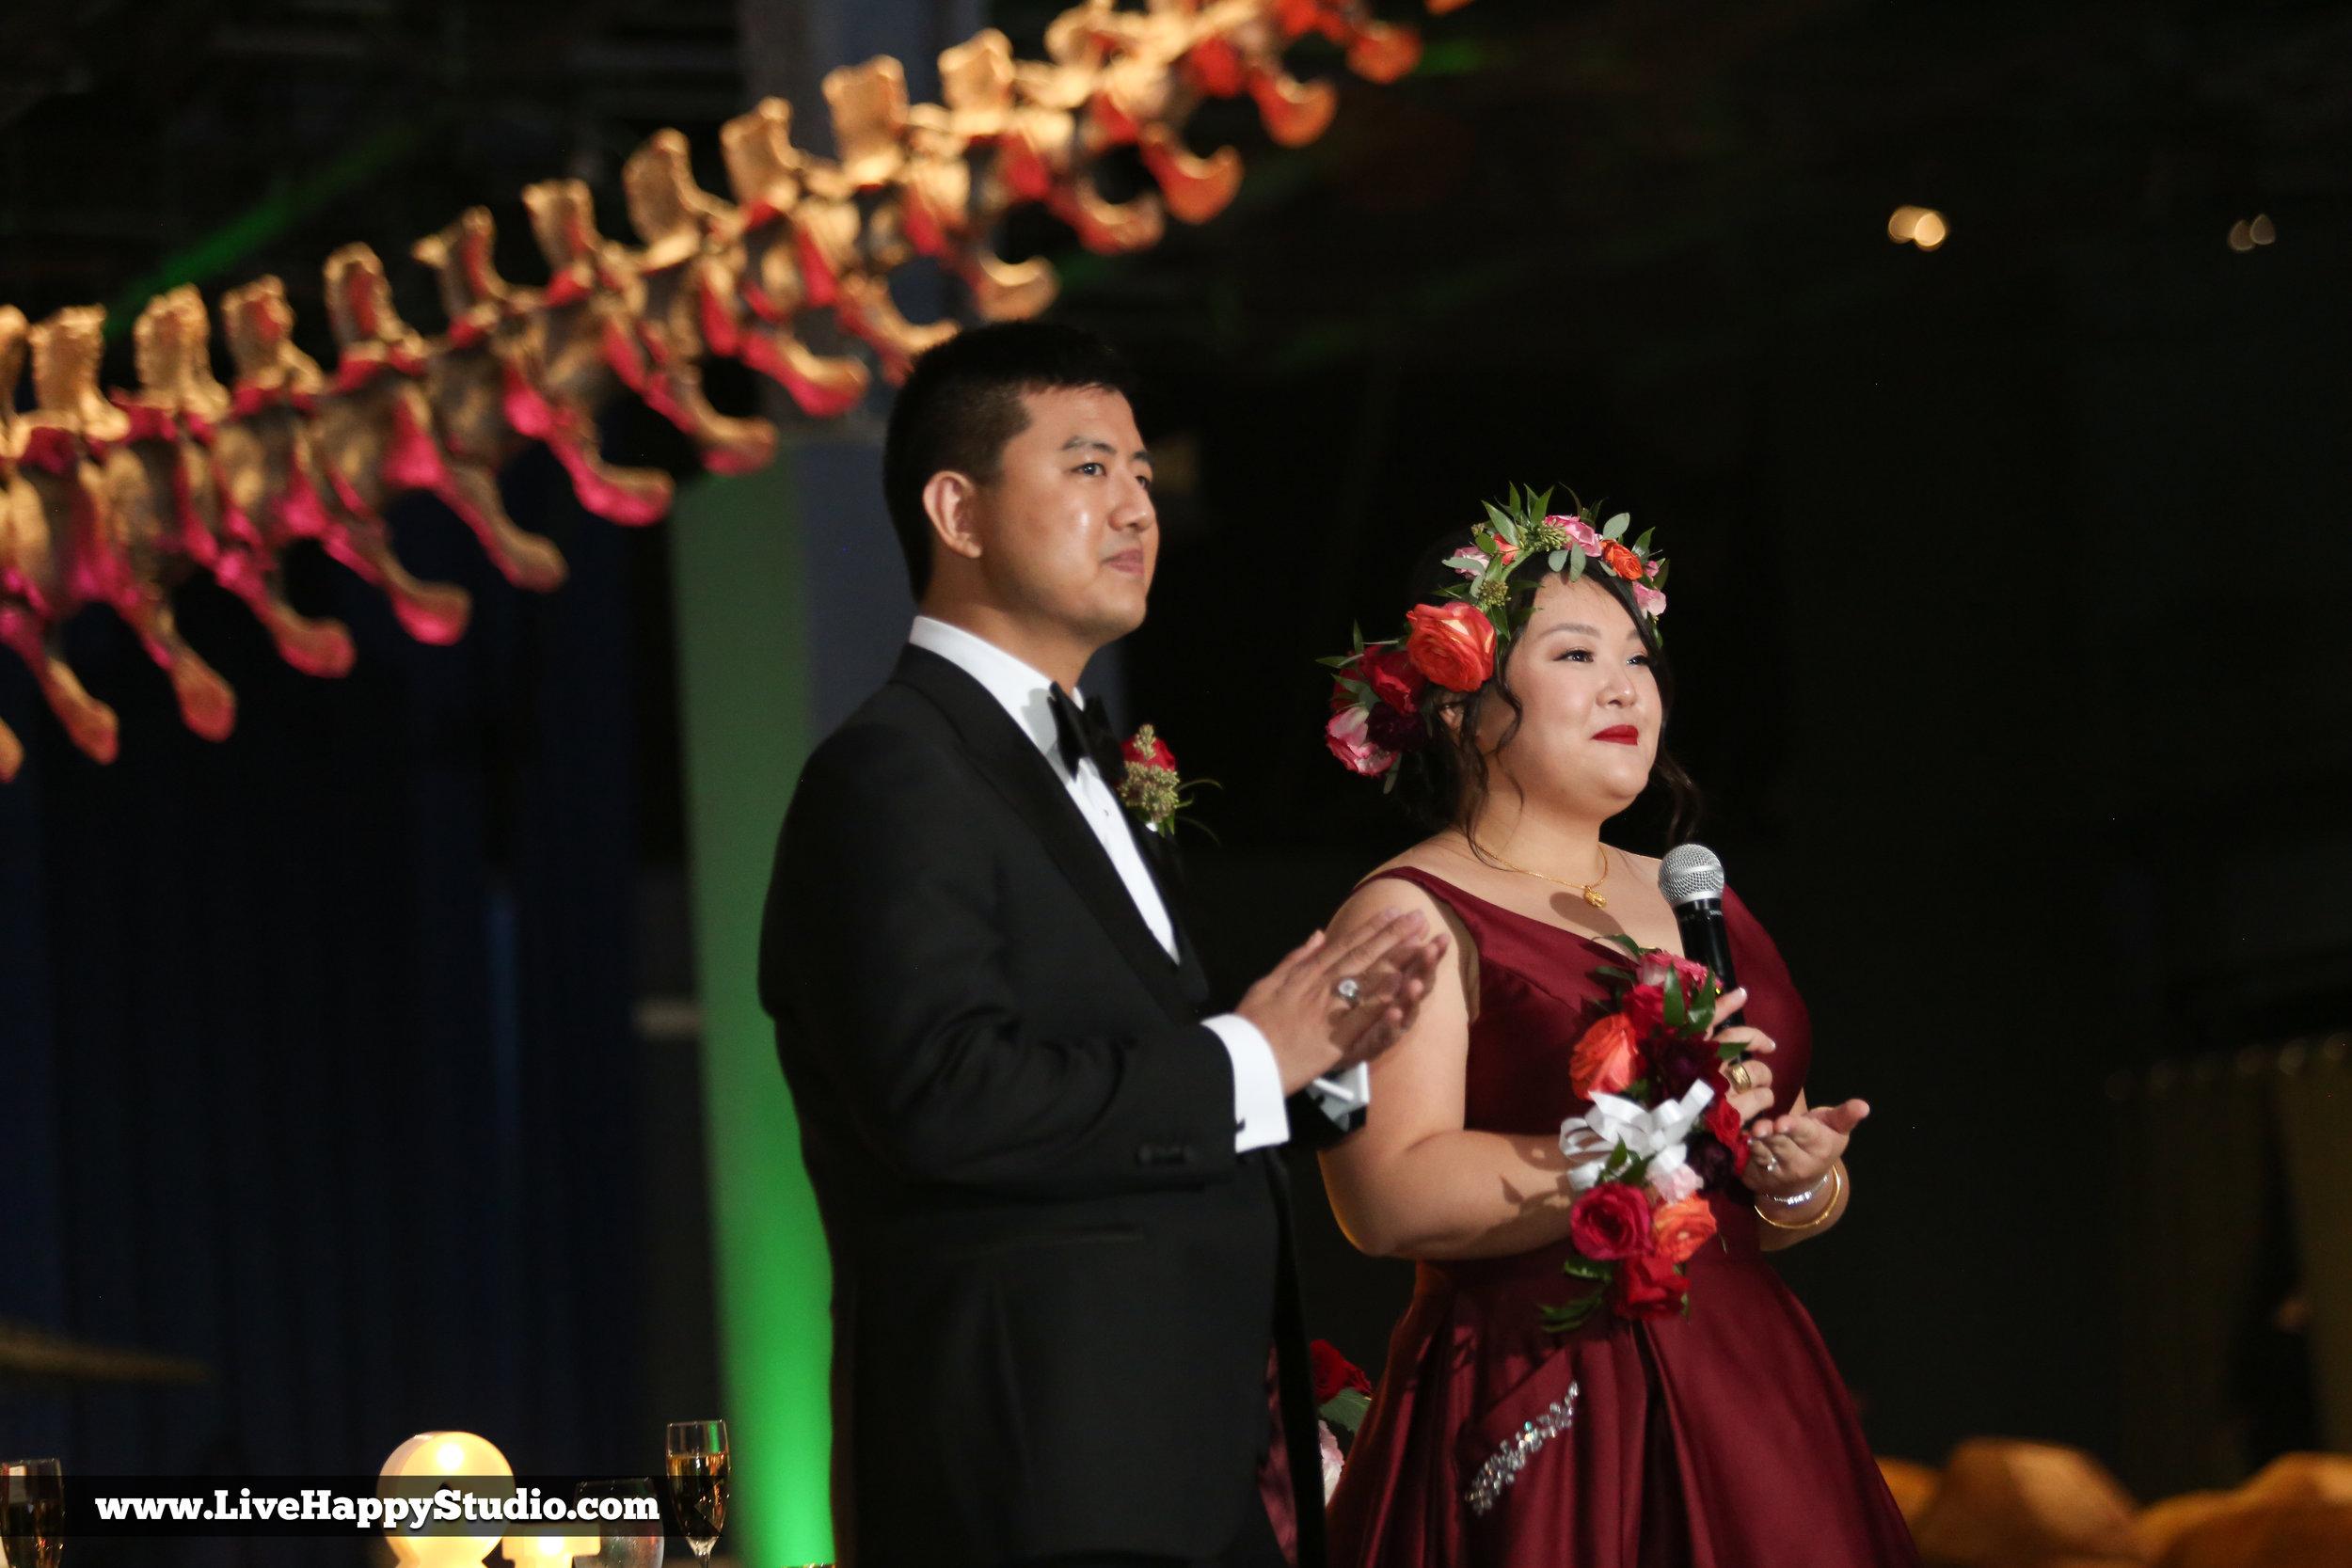 www.livehappystudio.com-orlando-science-center-museum-wedding-photography-photographer-candid-toast-reception25.jpg